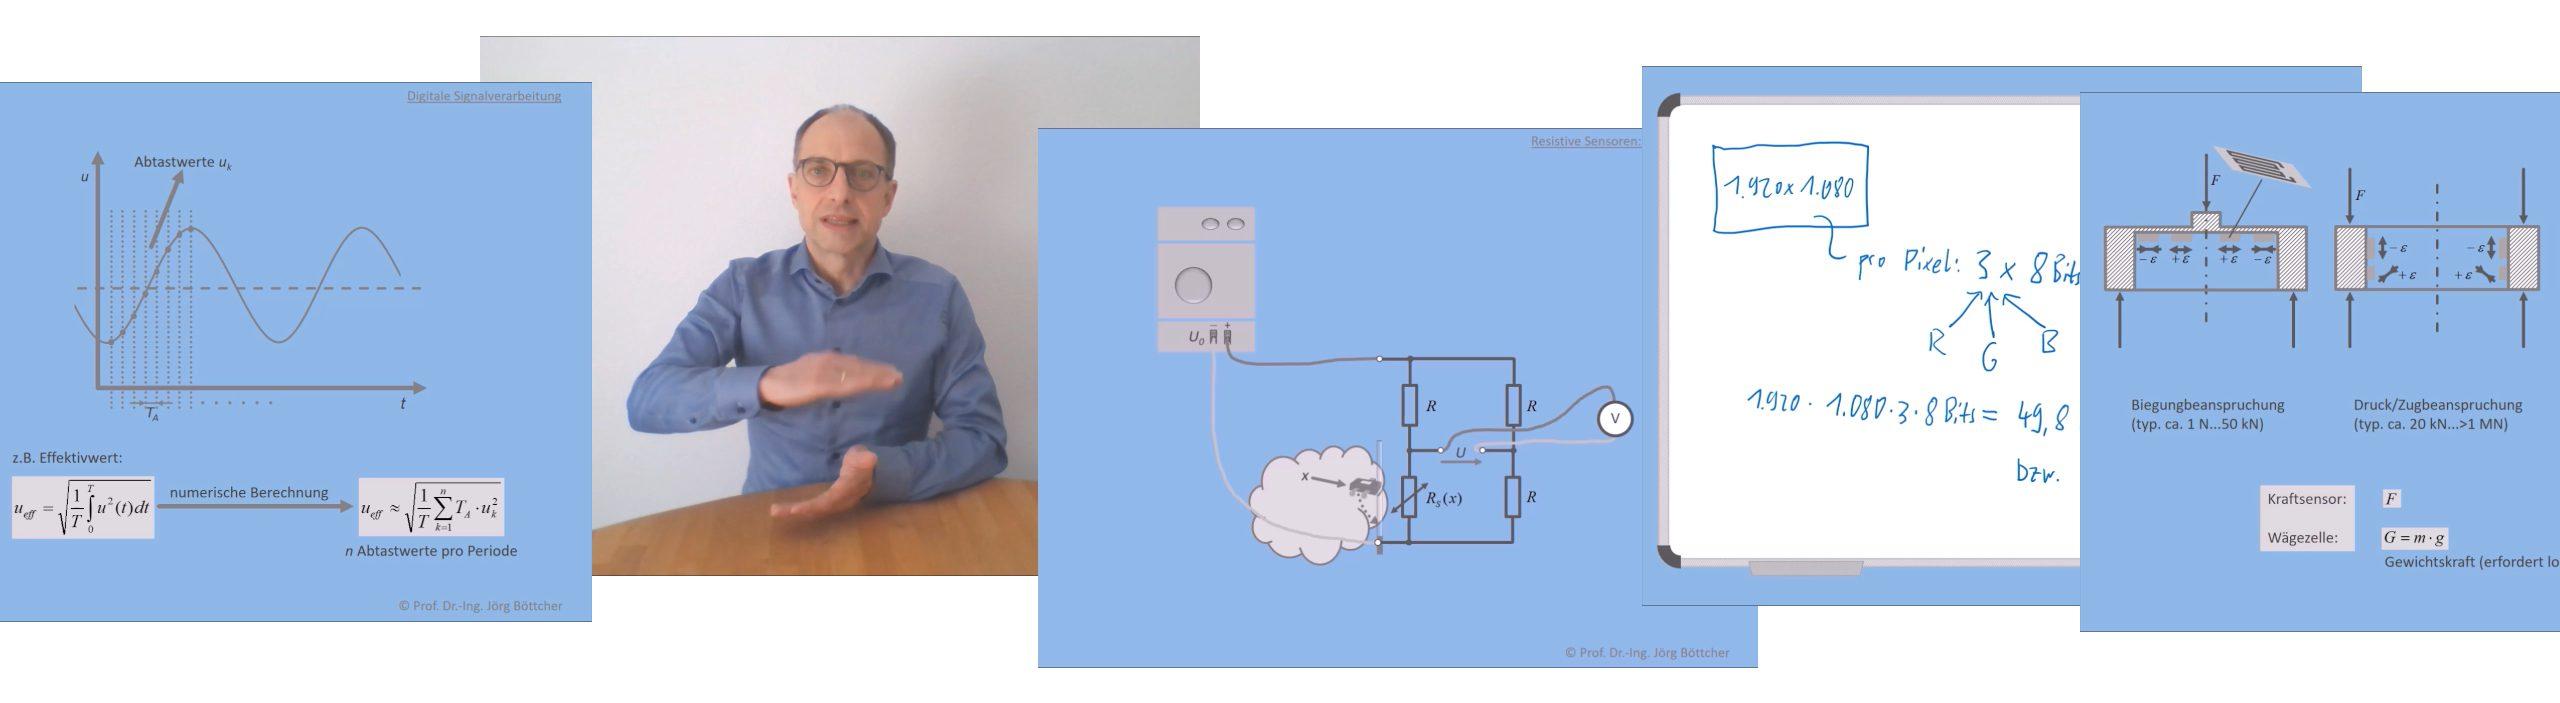 Messtechnik und Sensorik